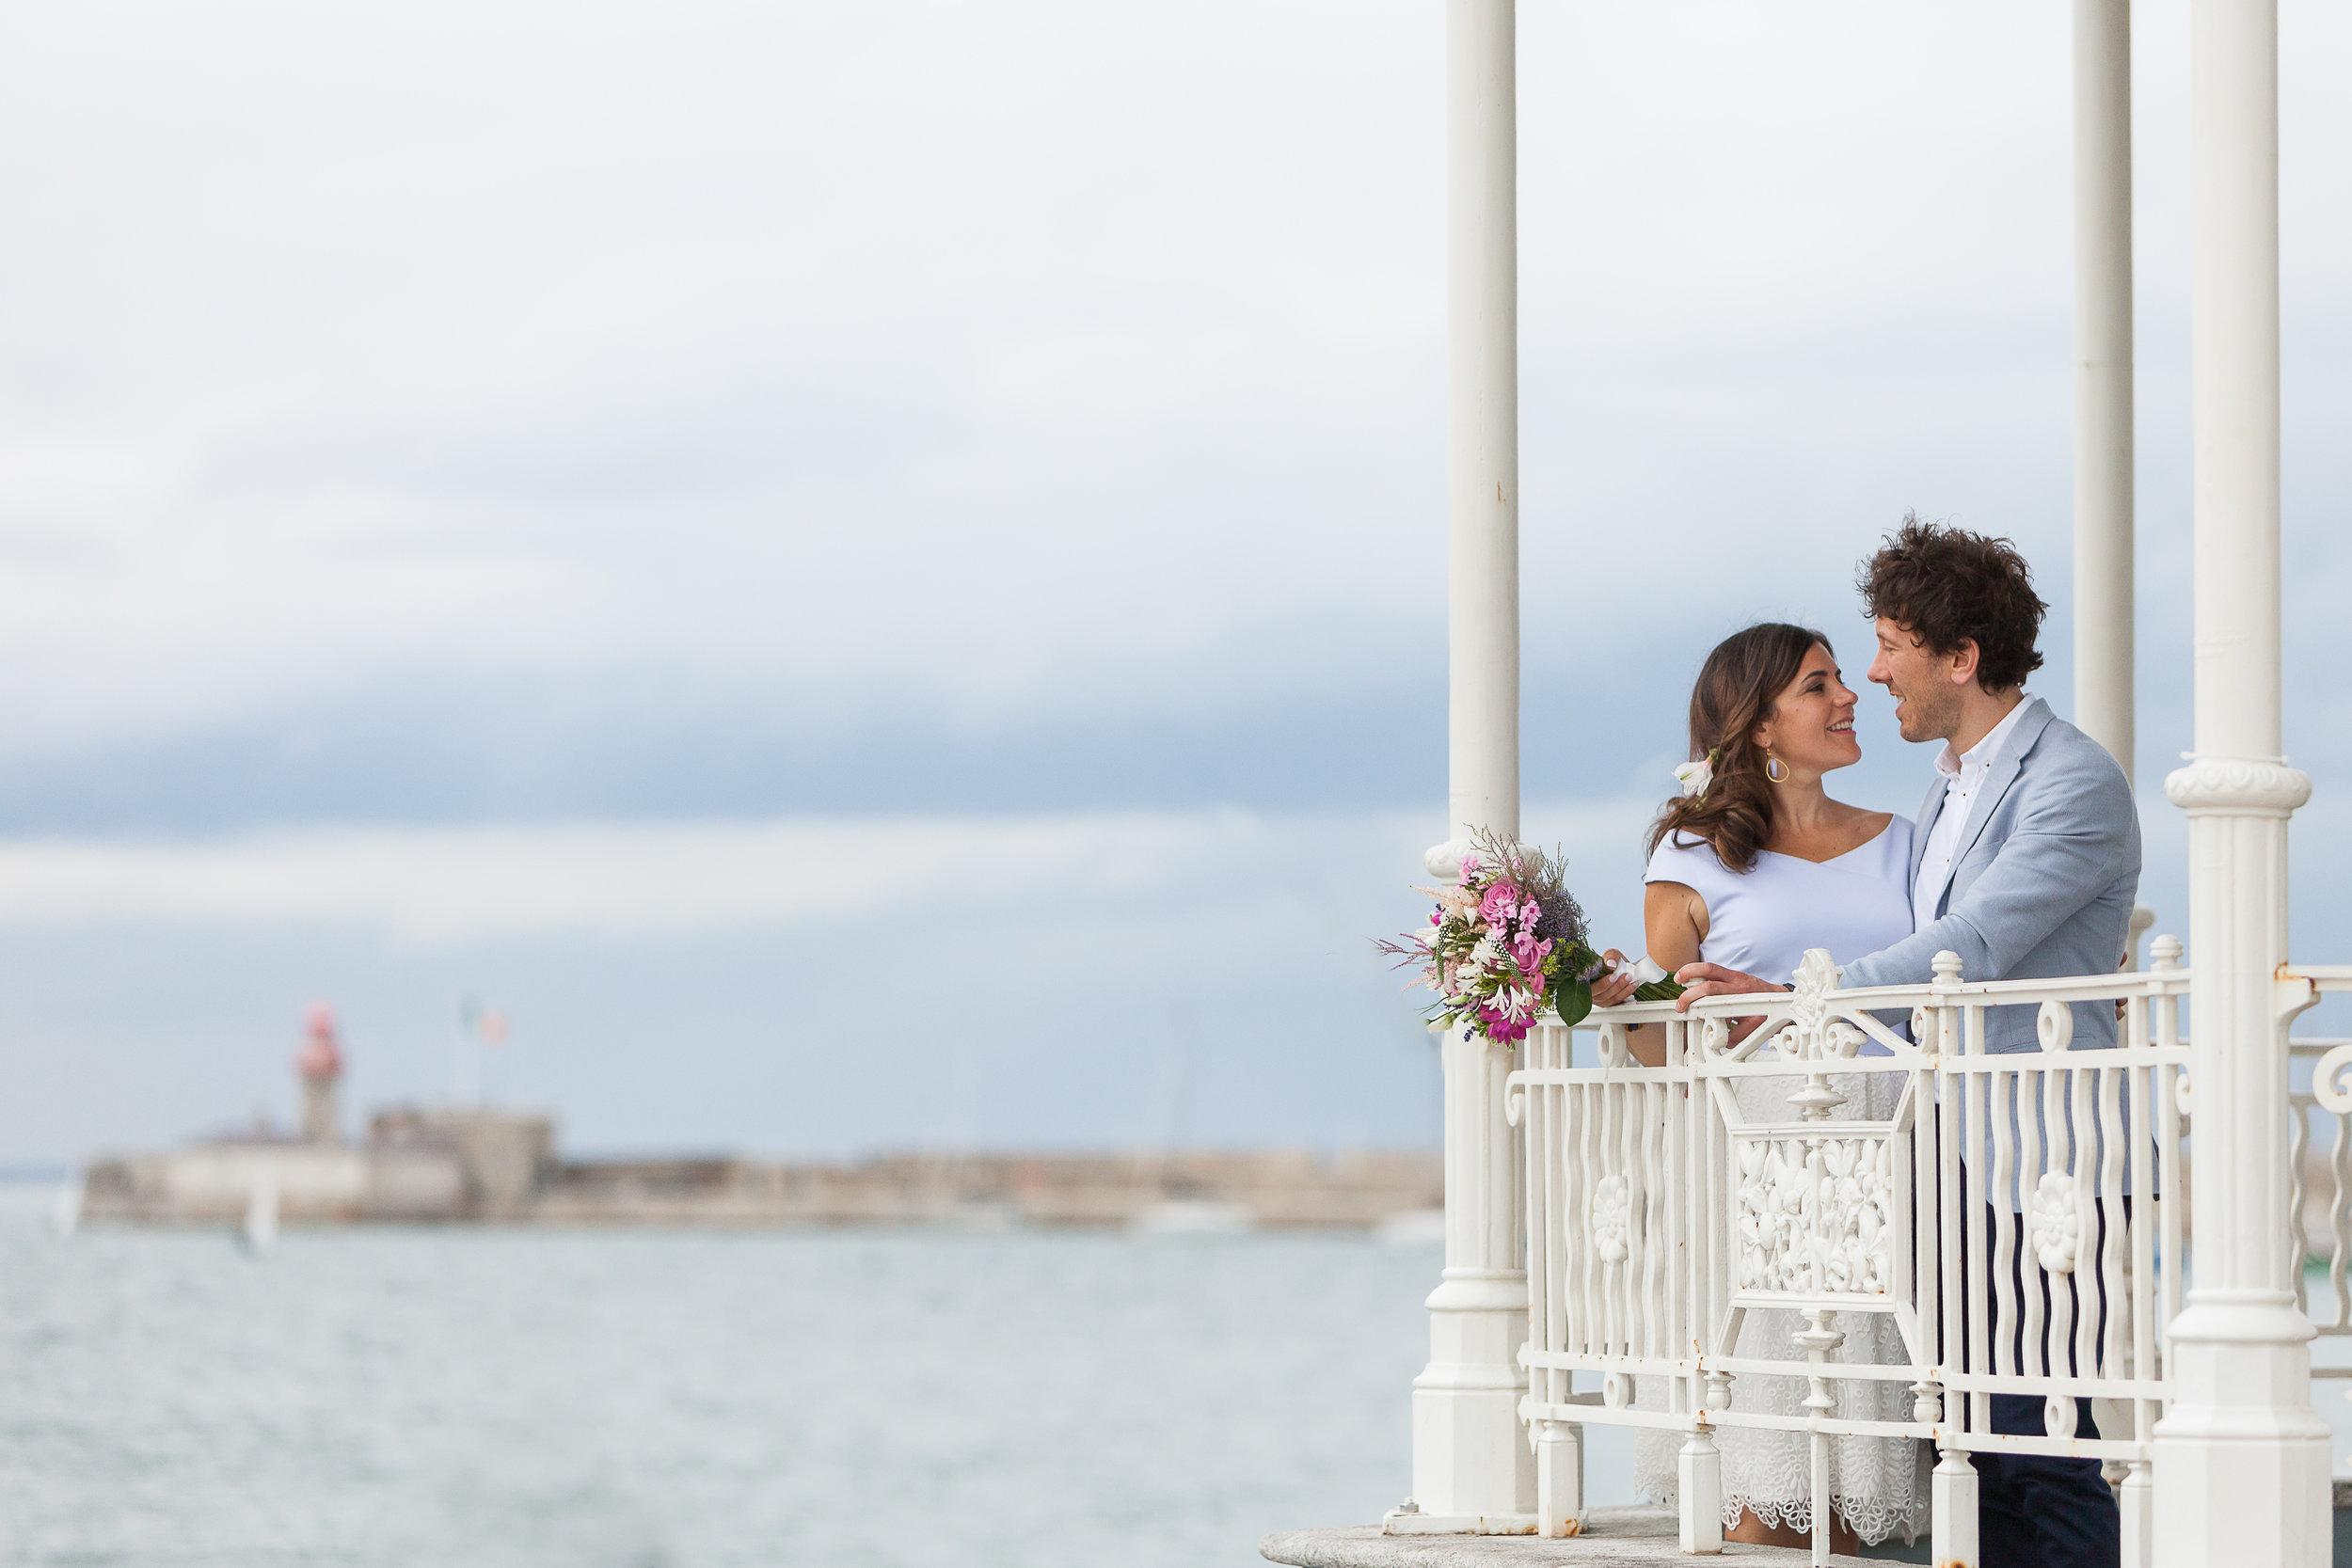 Dunlaioghaire pier wedding pictures